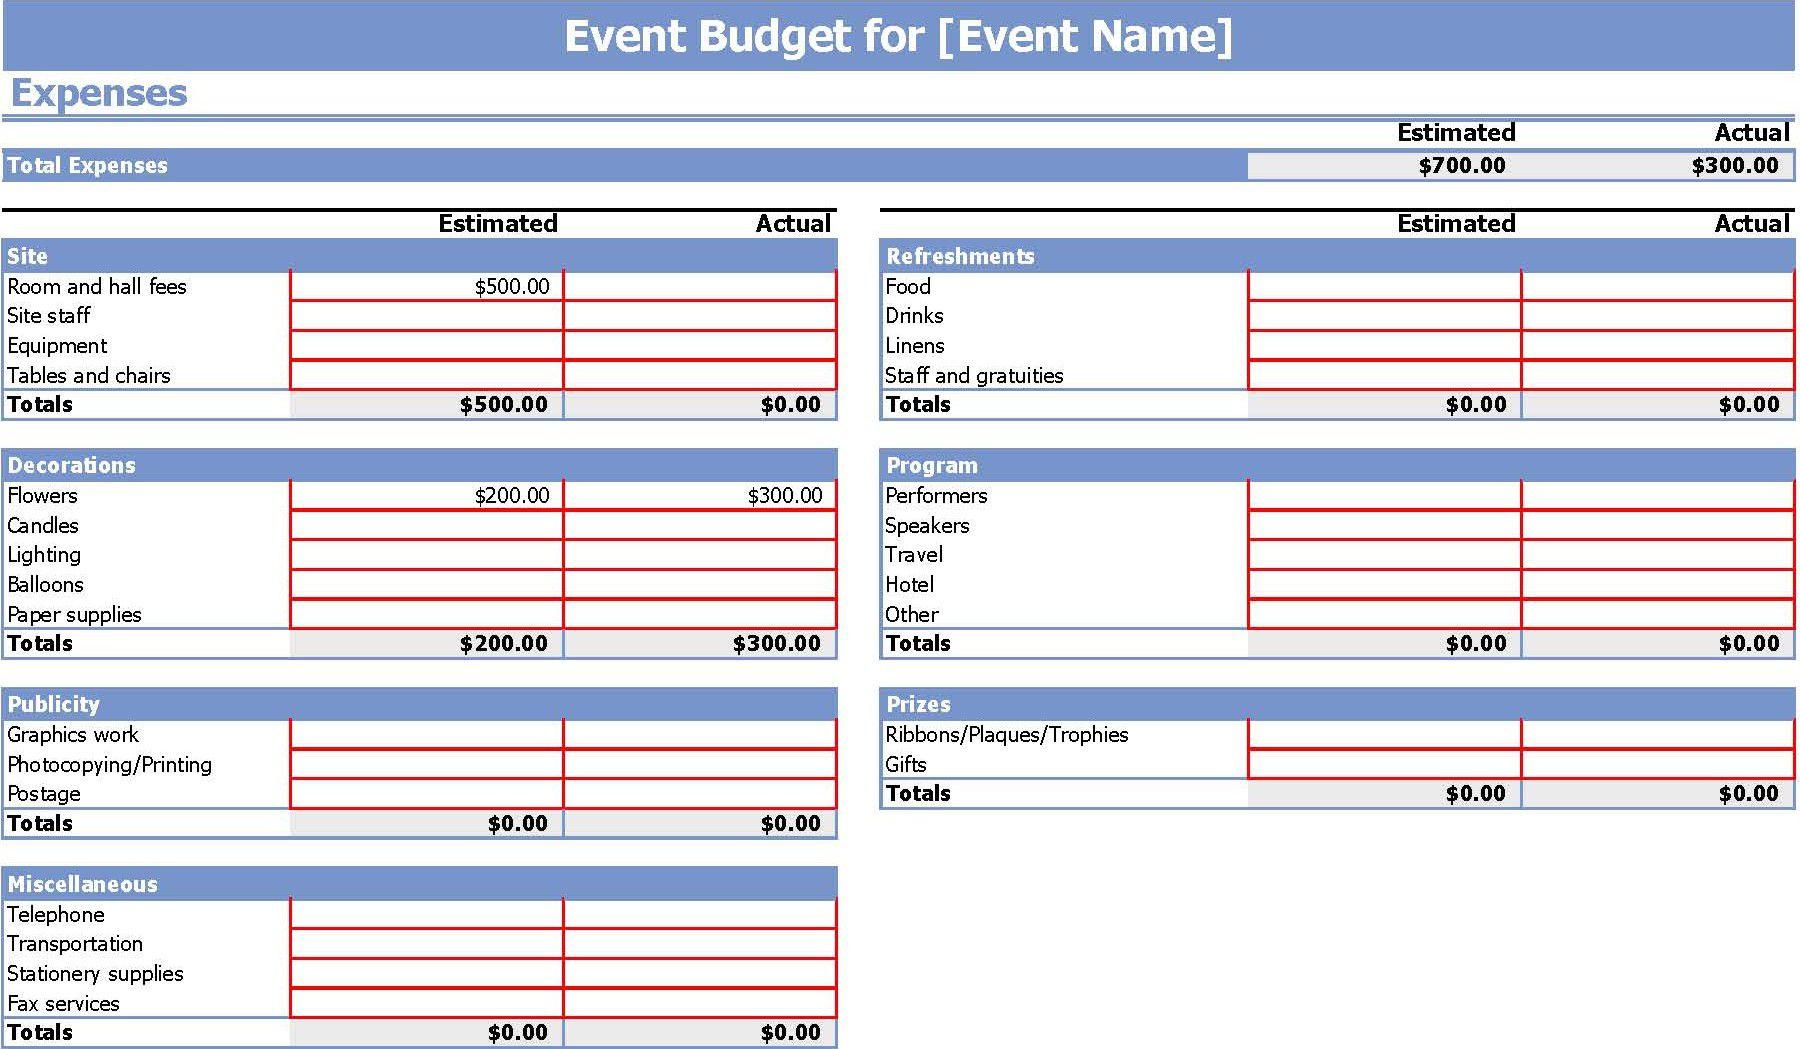 006 Stunning Event Planning Budget Worksheet Template Image  Free Download Planner SpreadsheetFull